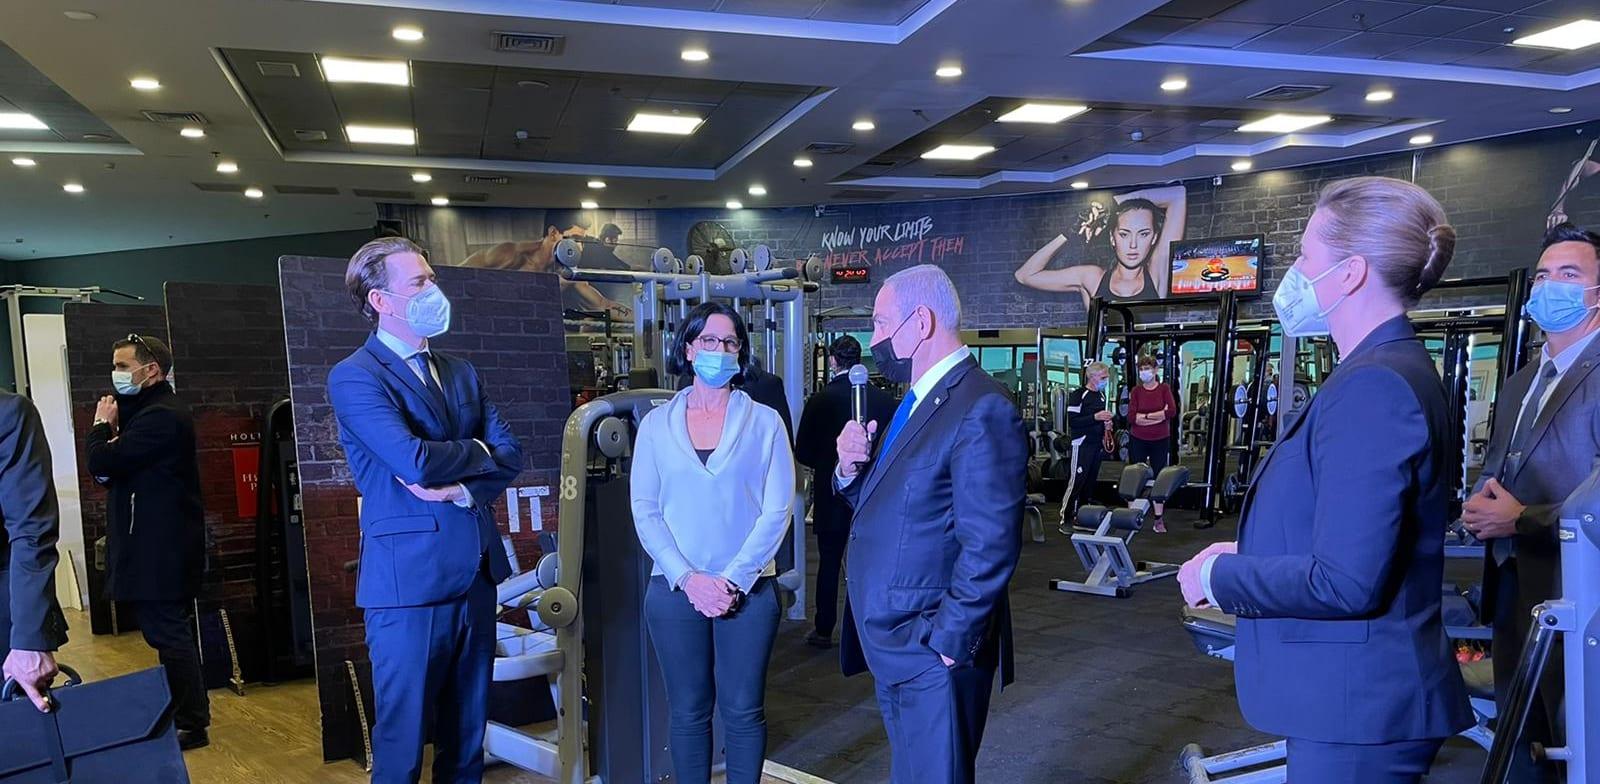 Chancellor Sebastian Kurz, Prime Minister Benjamin Netanyahu, and Prime Minister Mette Frederiksen visit a fitness club in Israel credit: Prime Minister's Office spokesperson